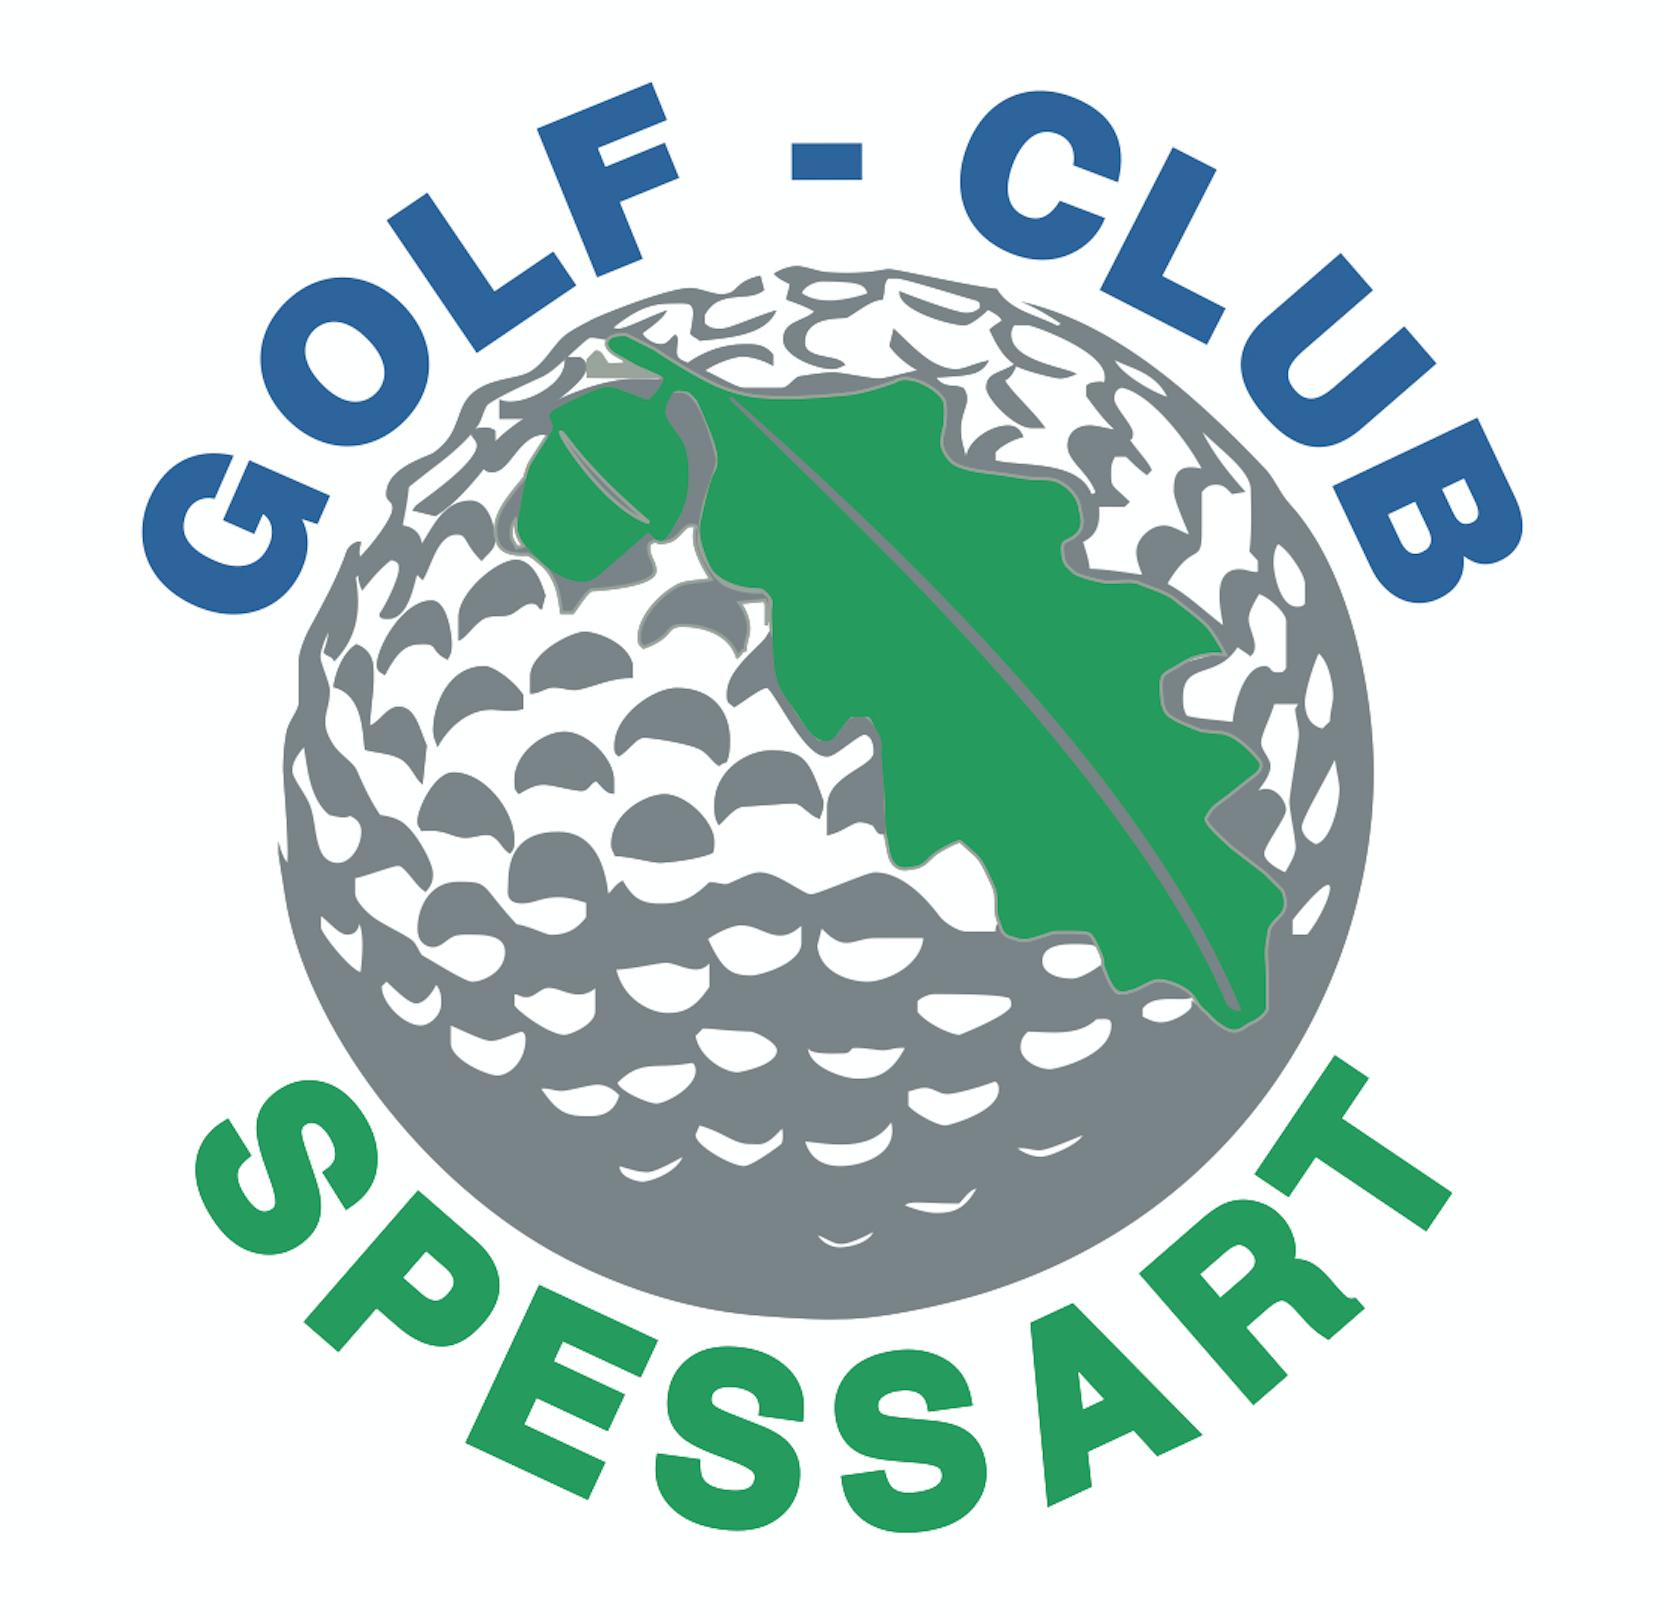 Billy Textilstickerei - Golf Logo Besticken.png